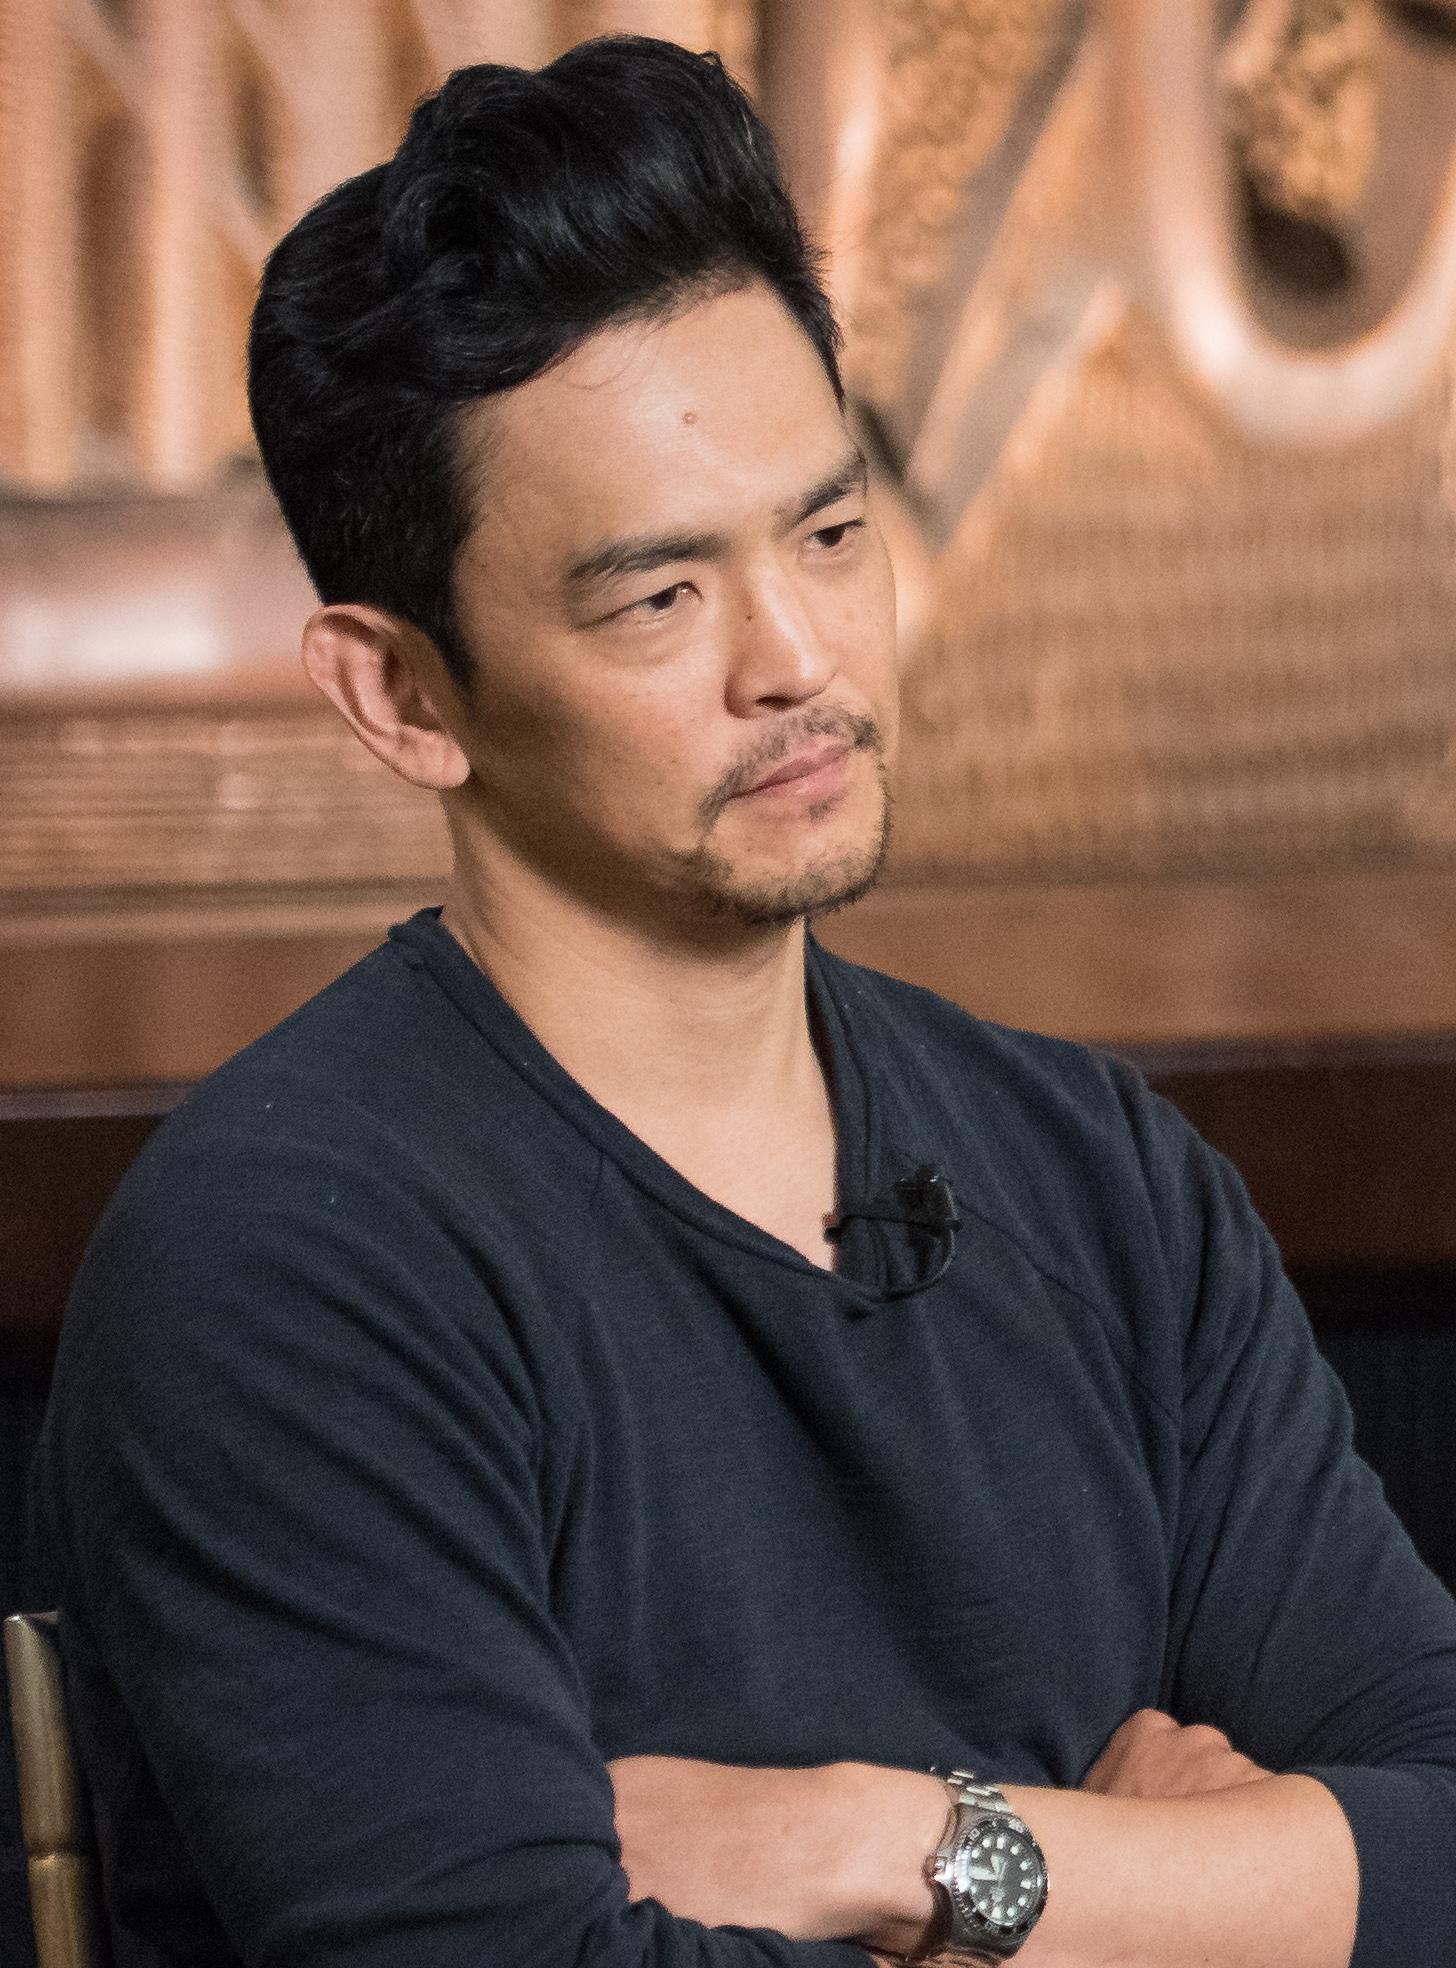 Cho in June 2018